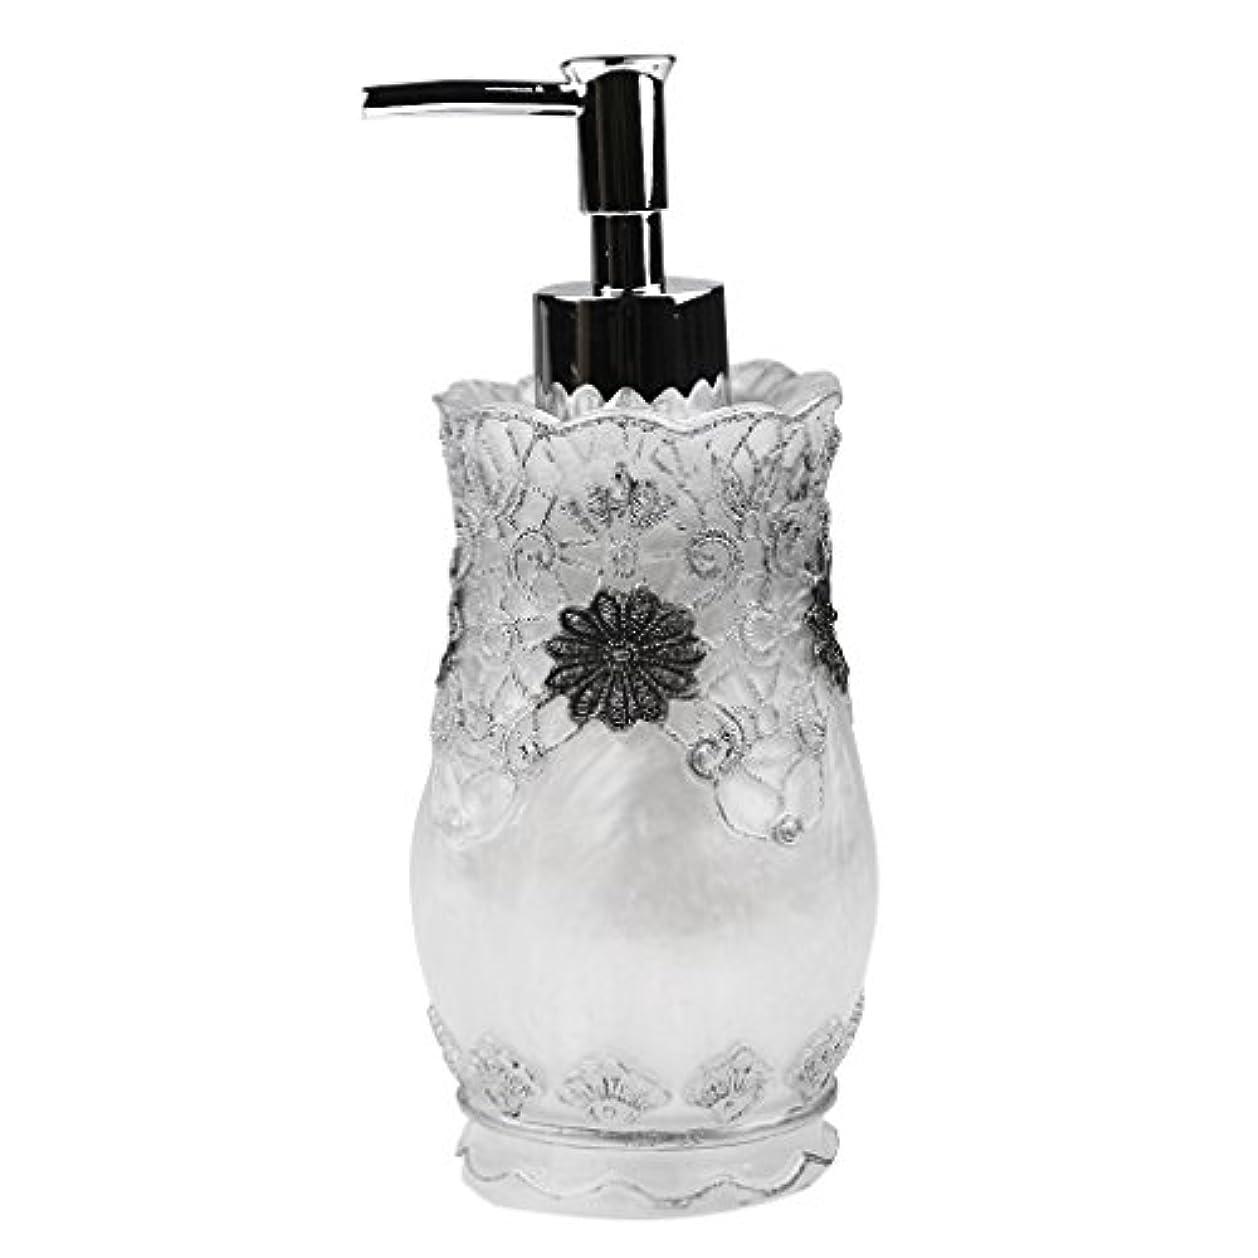 Flameer シャンプー ボディークレンザー 液体石鹸などローション適用 詰め替え 高品質 樹脂 空 ポンプ瓶 全4種類  - #2